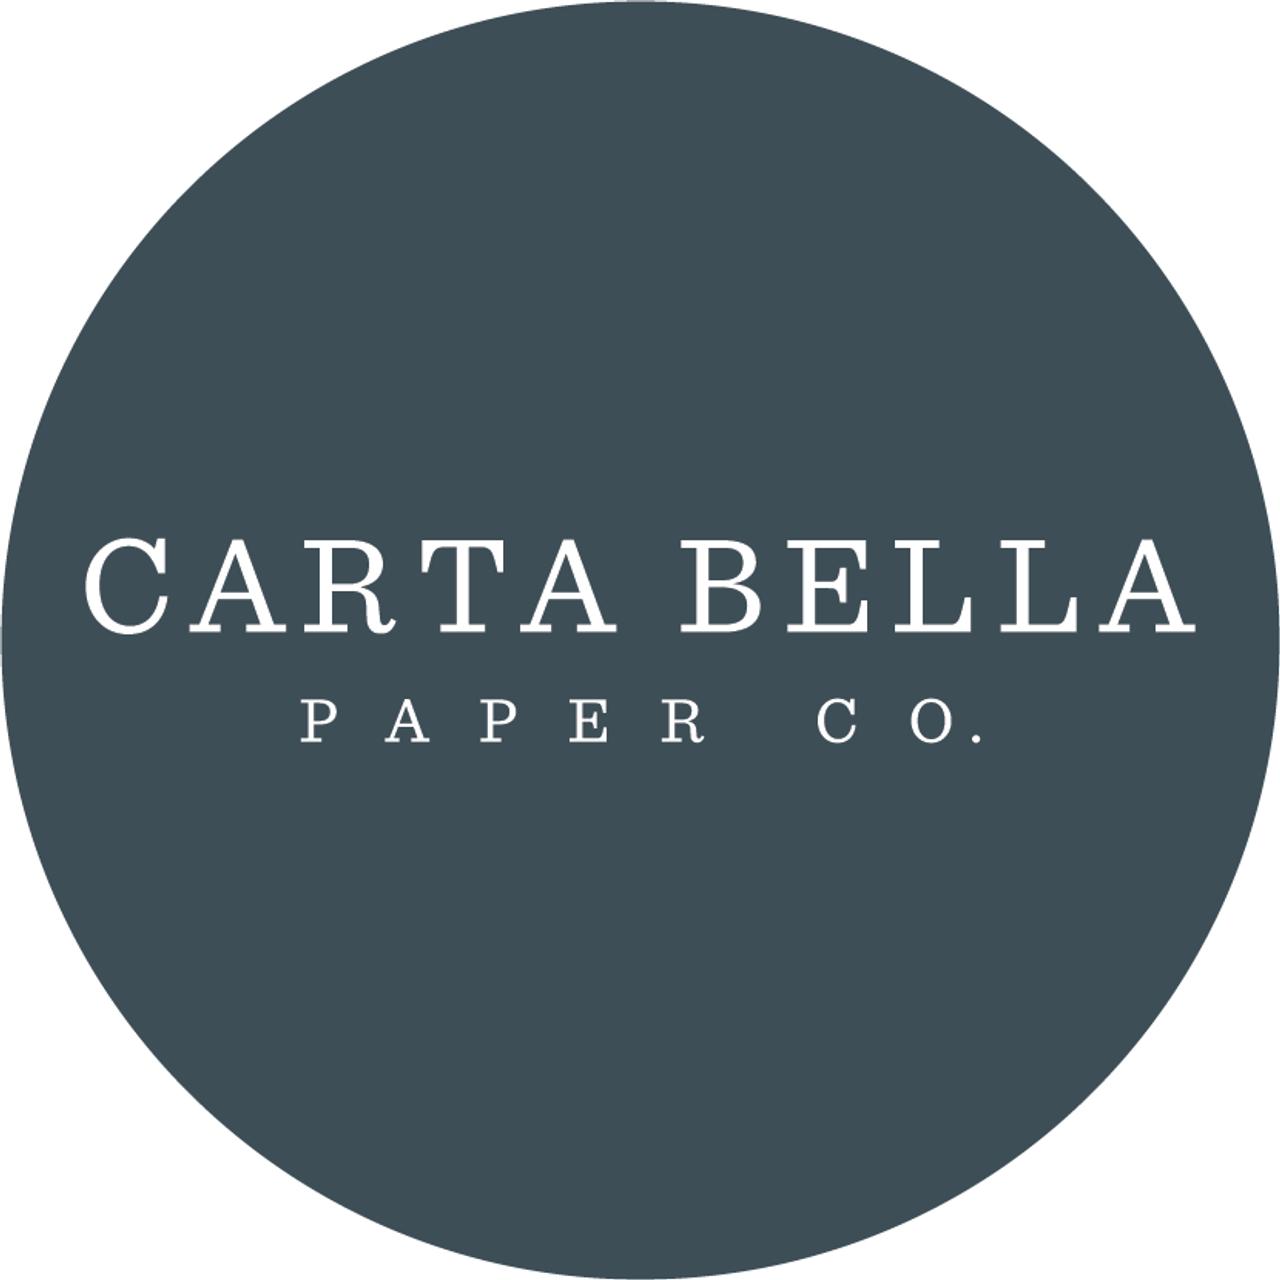 Carta Bella Paper Co.